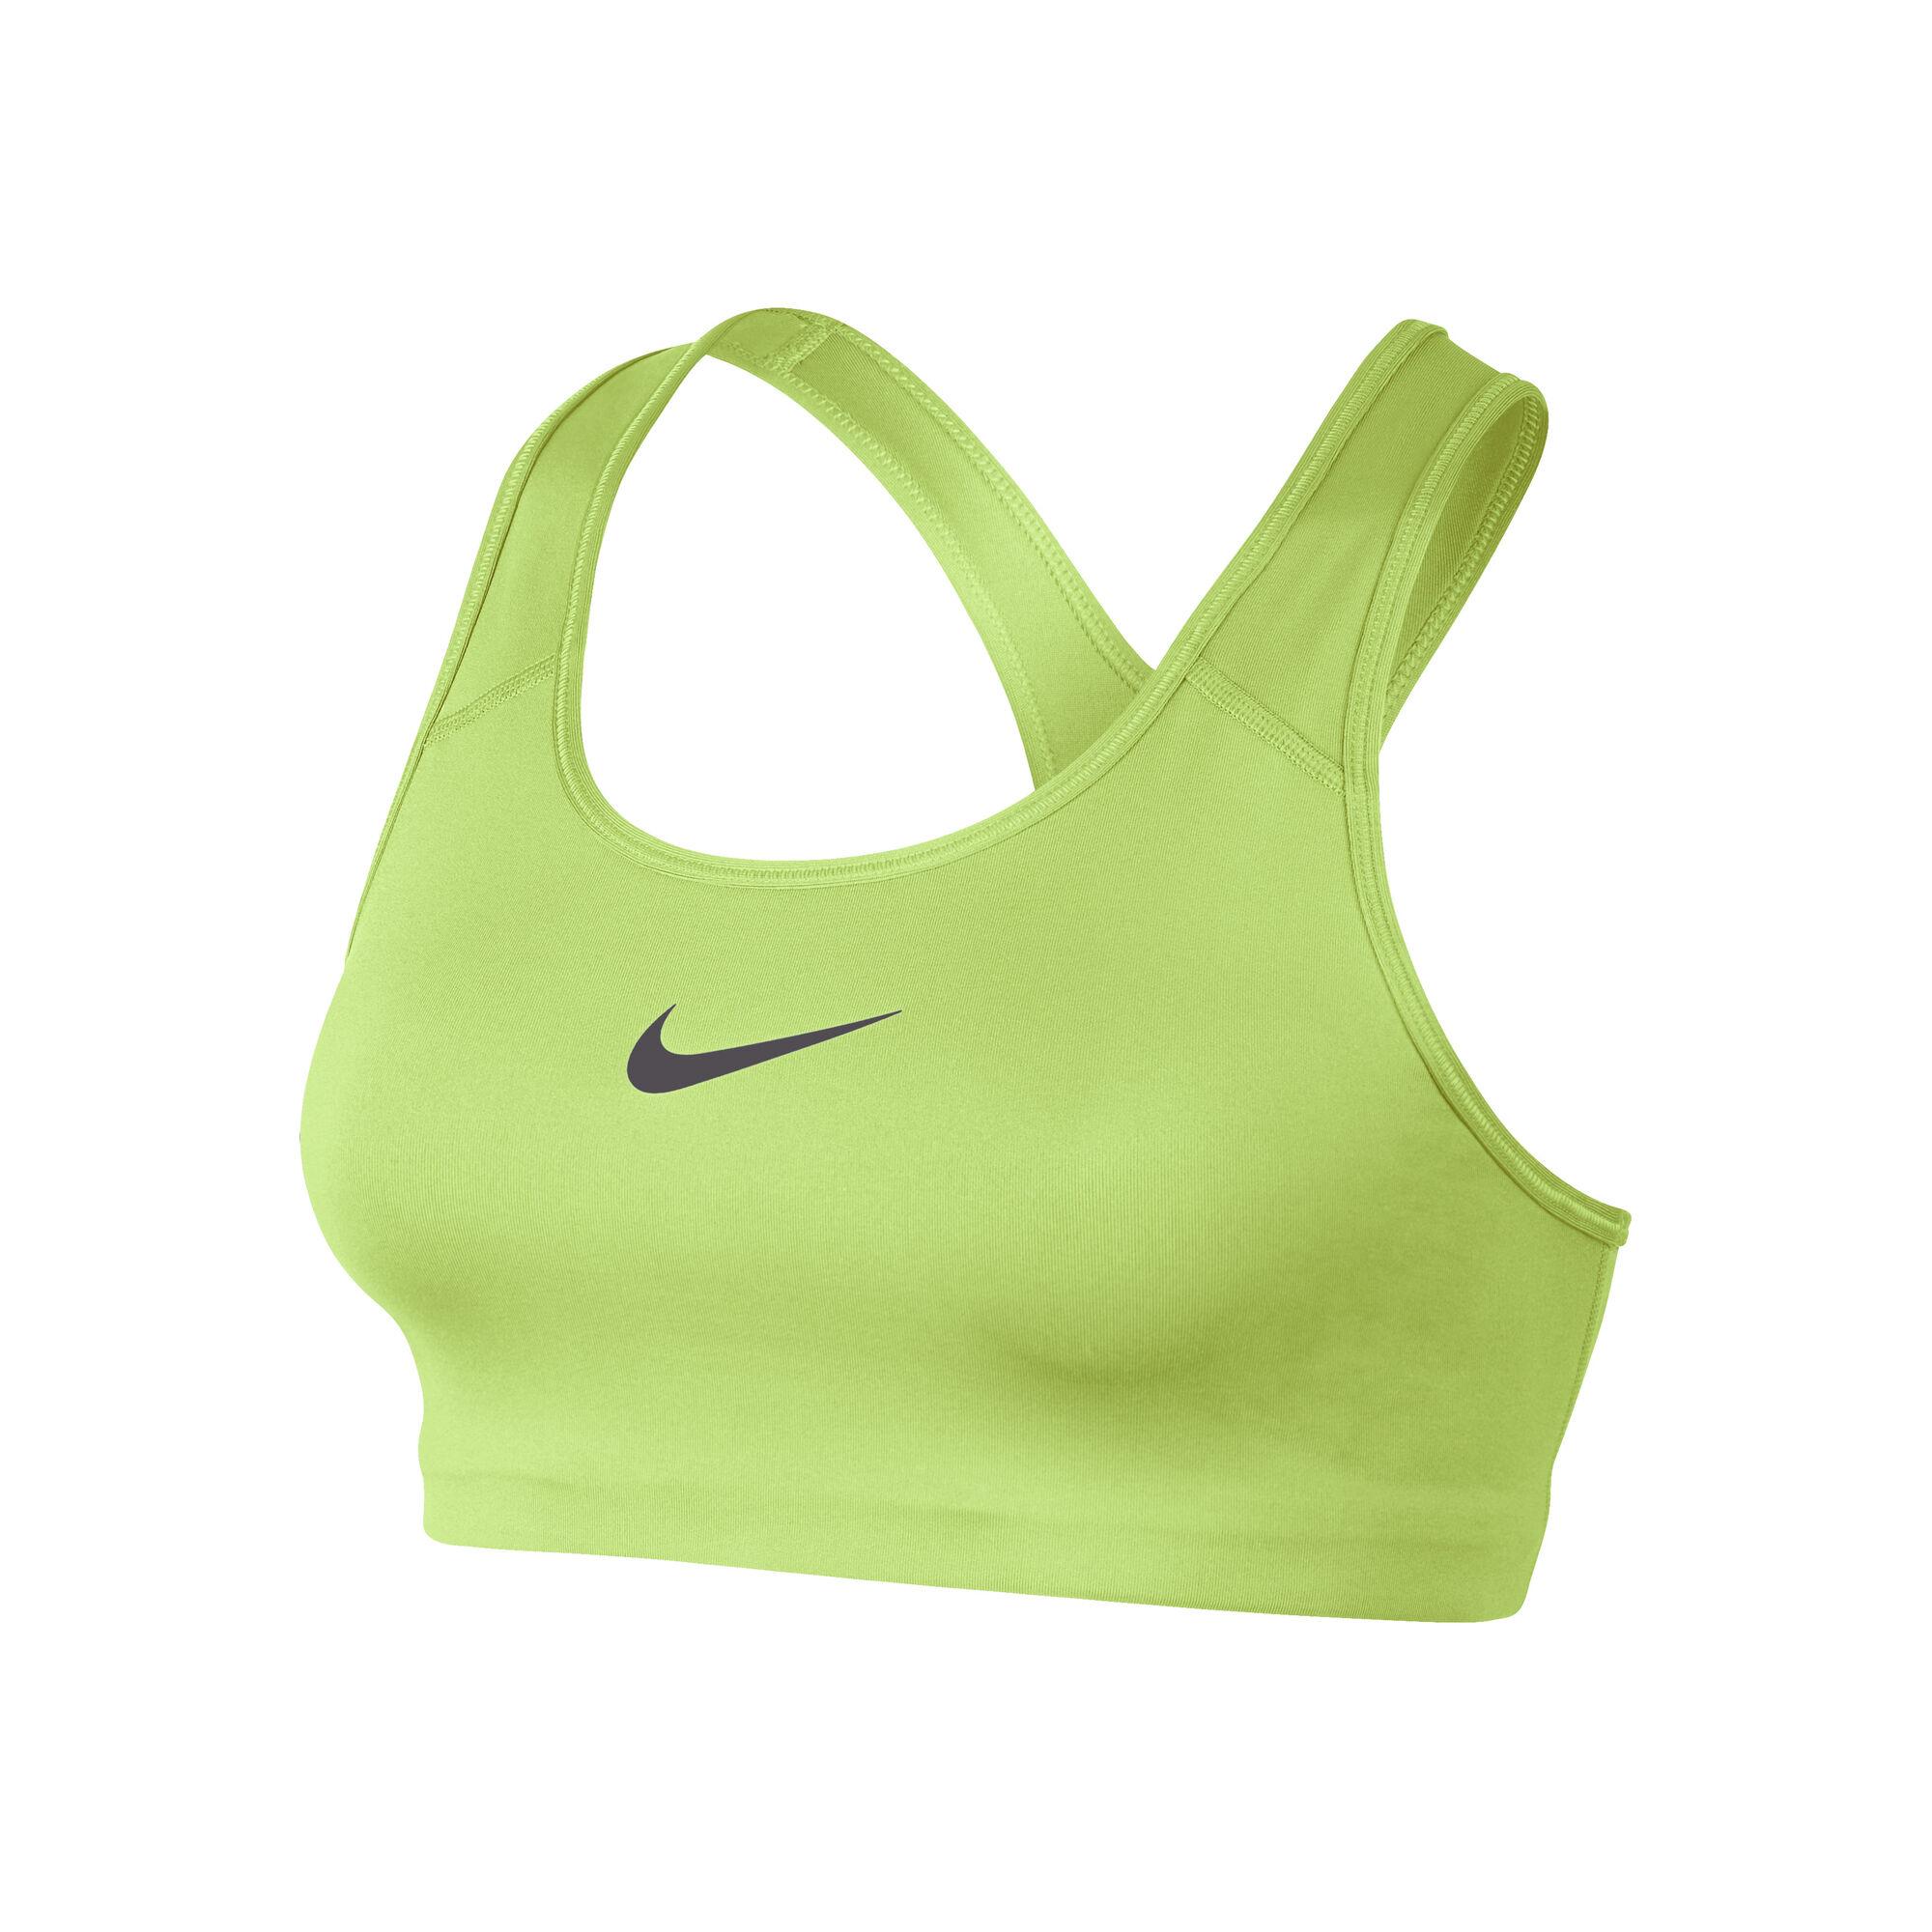 d61a8a93ff9fb buy Nike Swoosh Sports Bras Women - Neon Green